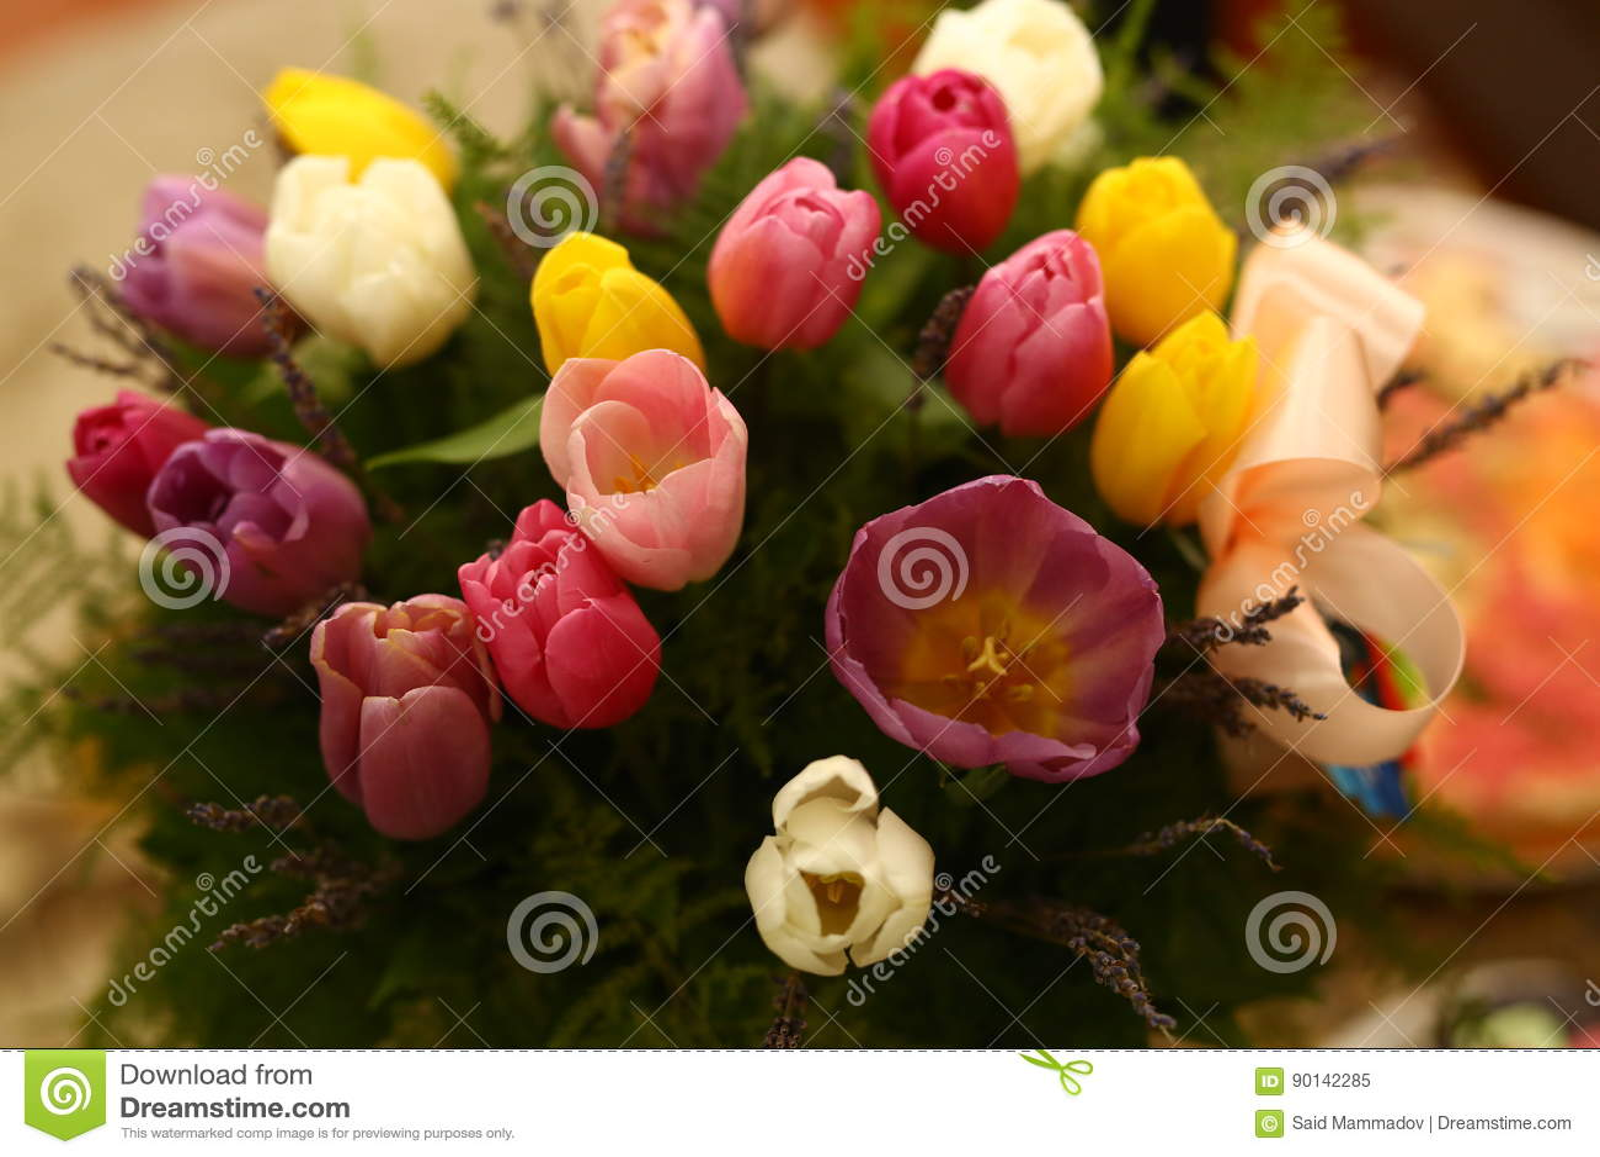 Beautiful Purple Colored Tulip Flowers Background Stock Image ...